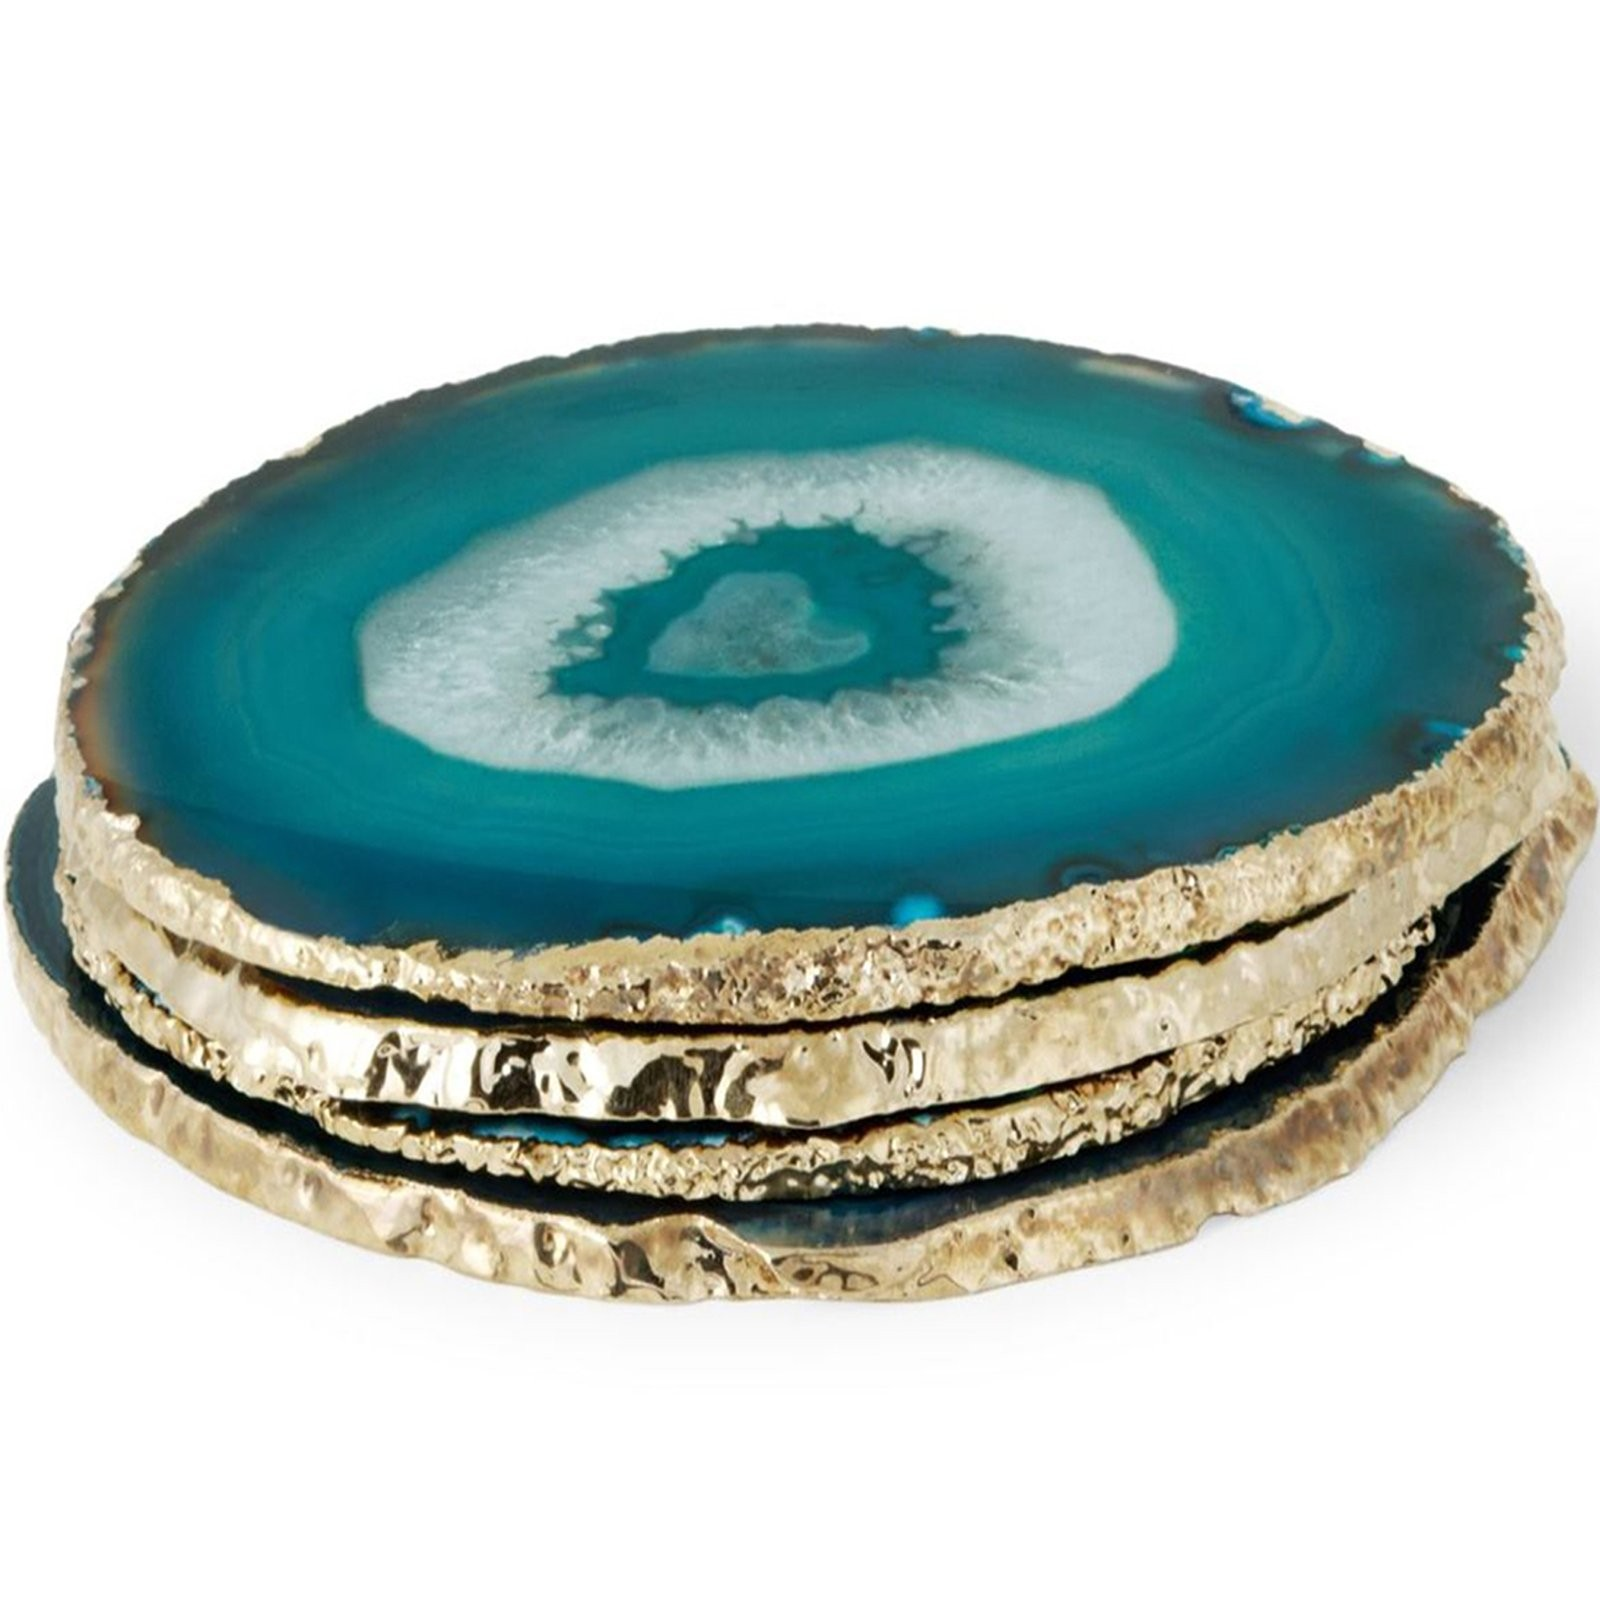 Aerin I Set Of 4 Teal Agate Coasters